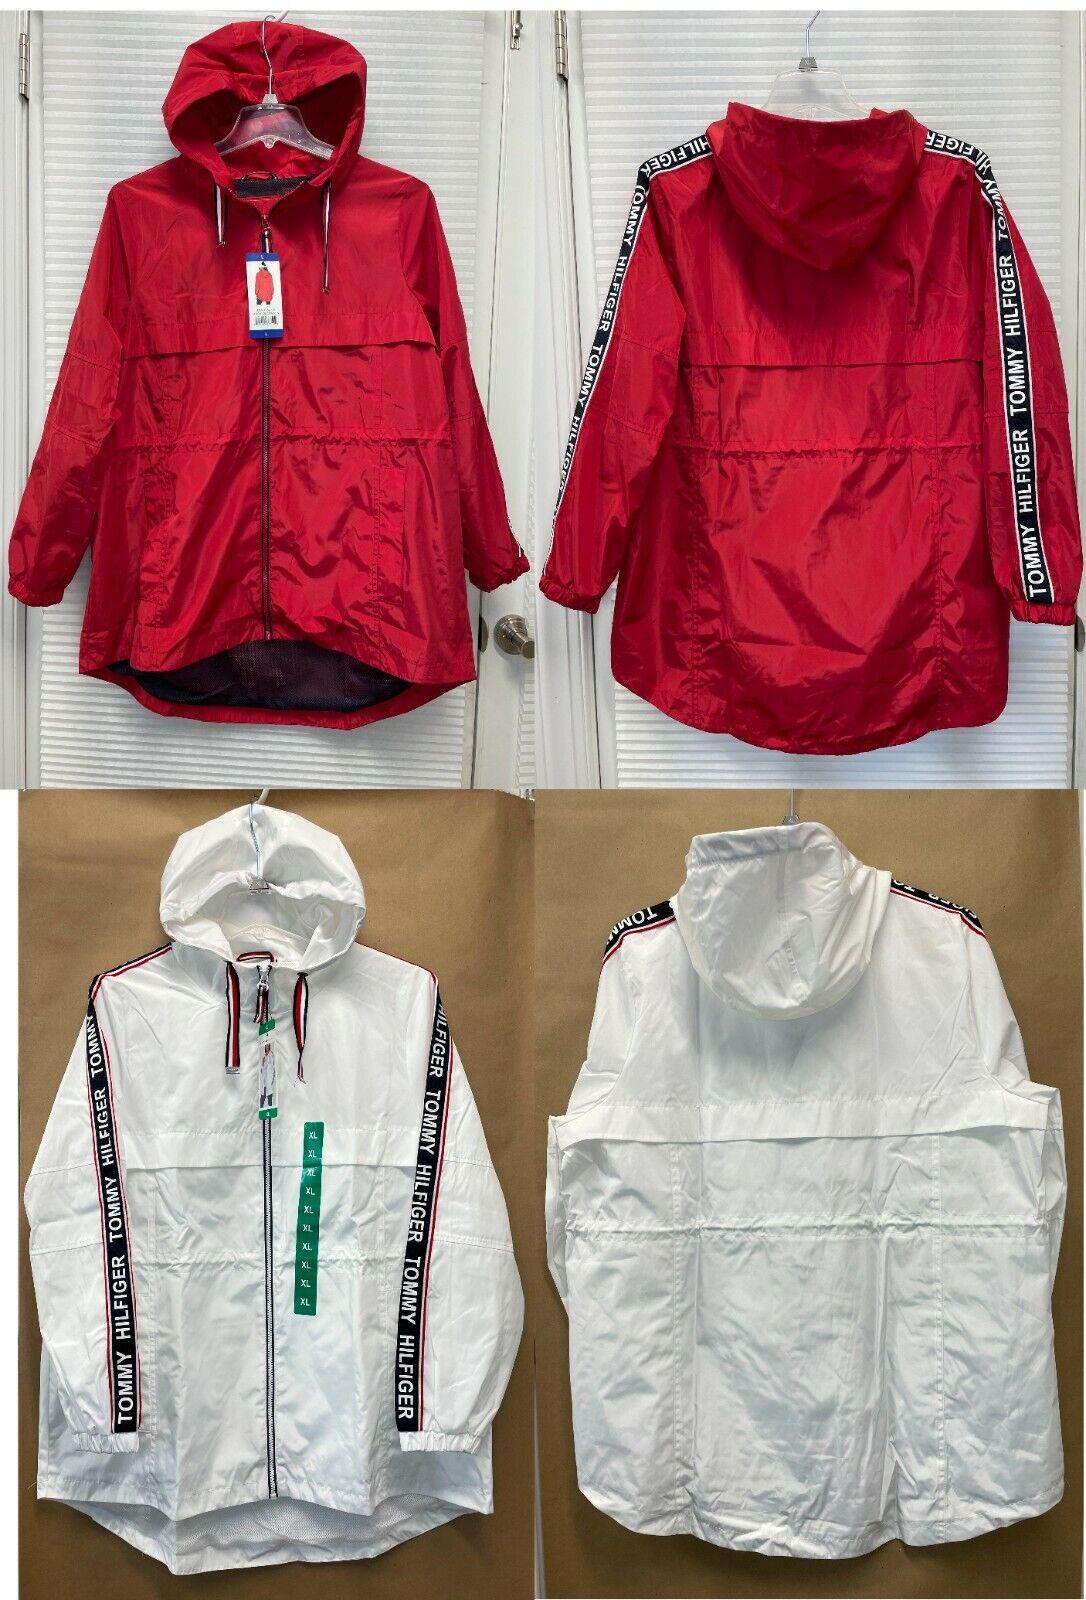 Tommy Hilfiger Womens Light Weight Long Windbreaker Hooded Rain Jacket - NWT